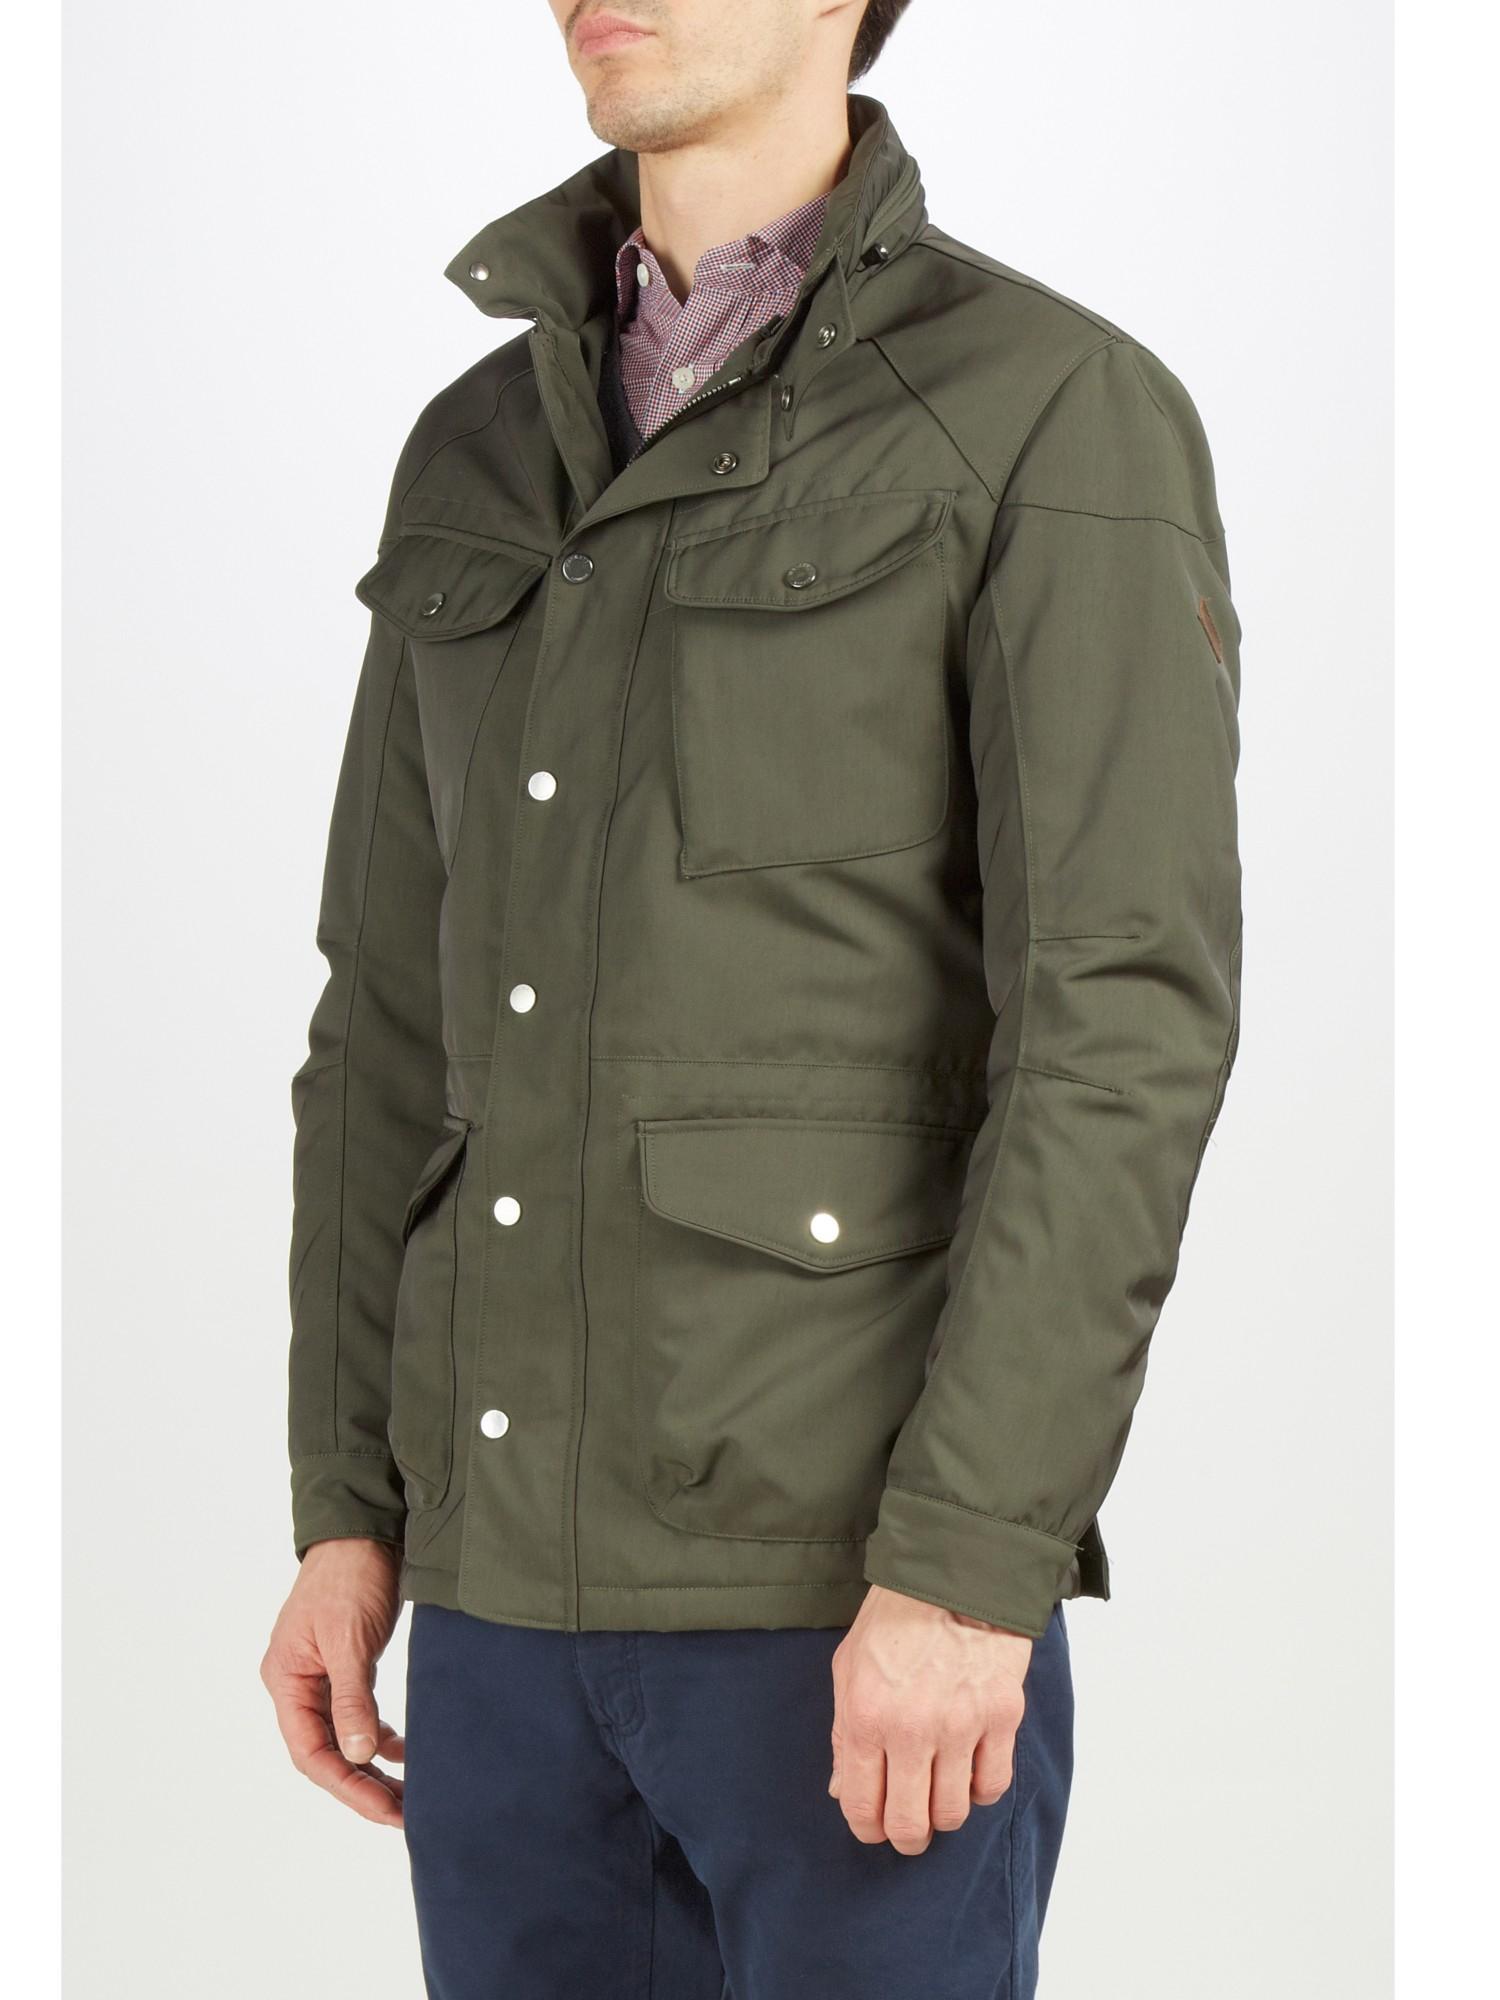 jackets mens moncler 2014 moncler montgenevre winter